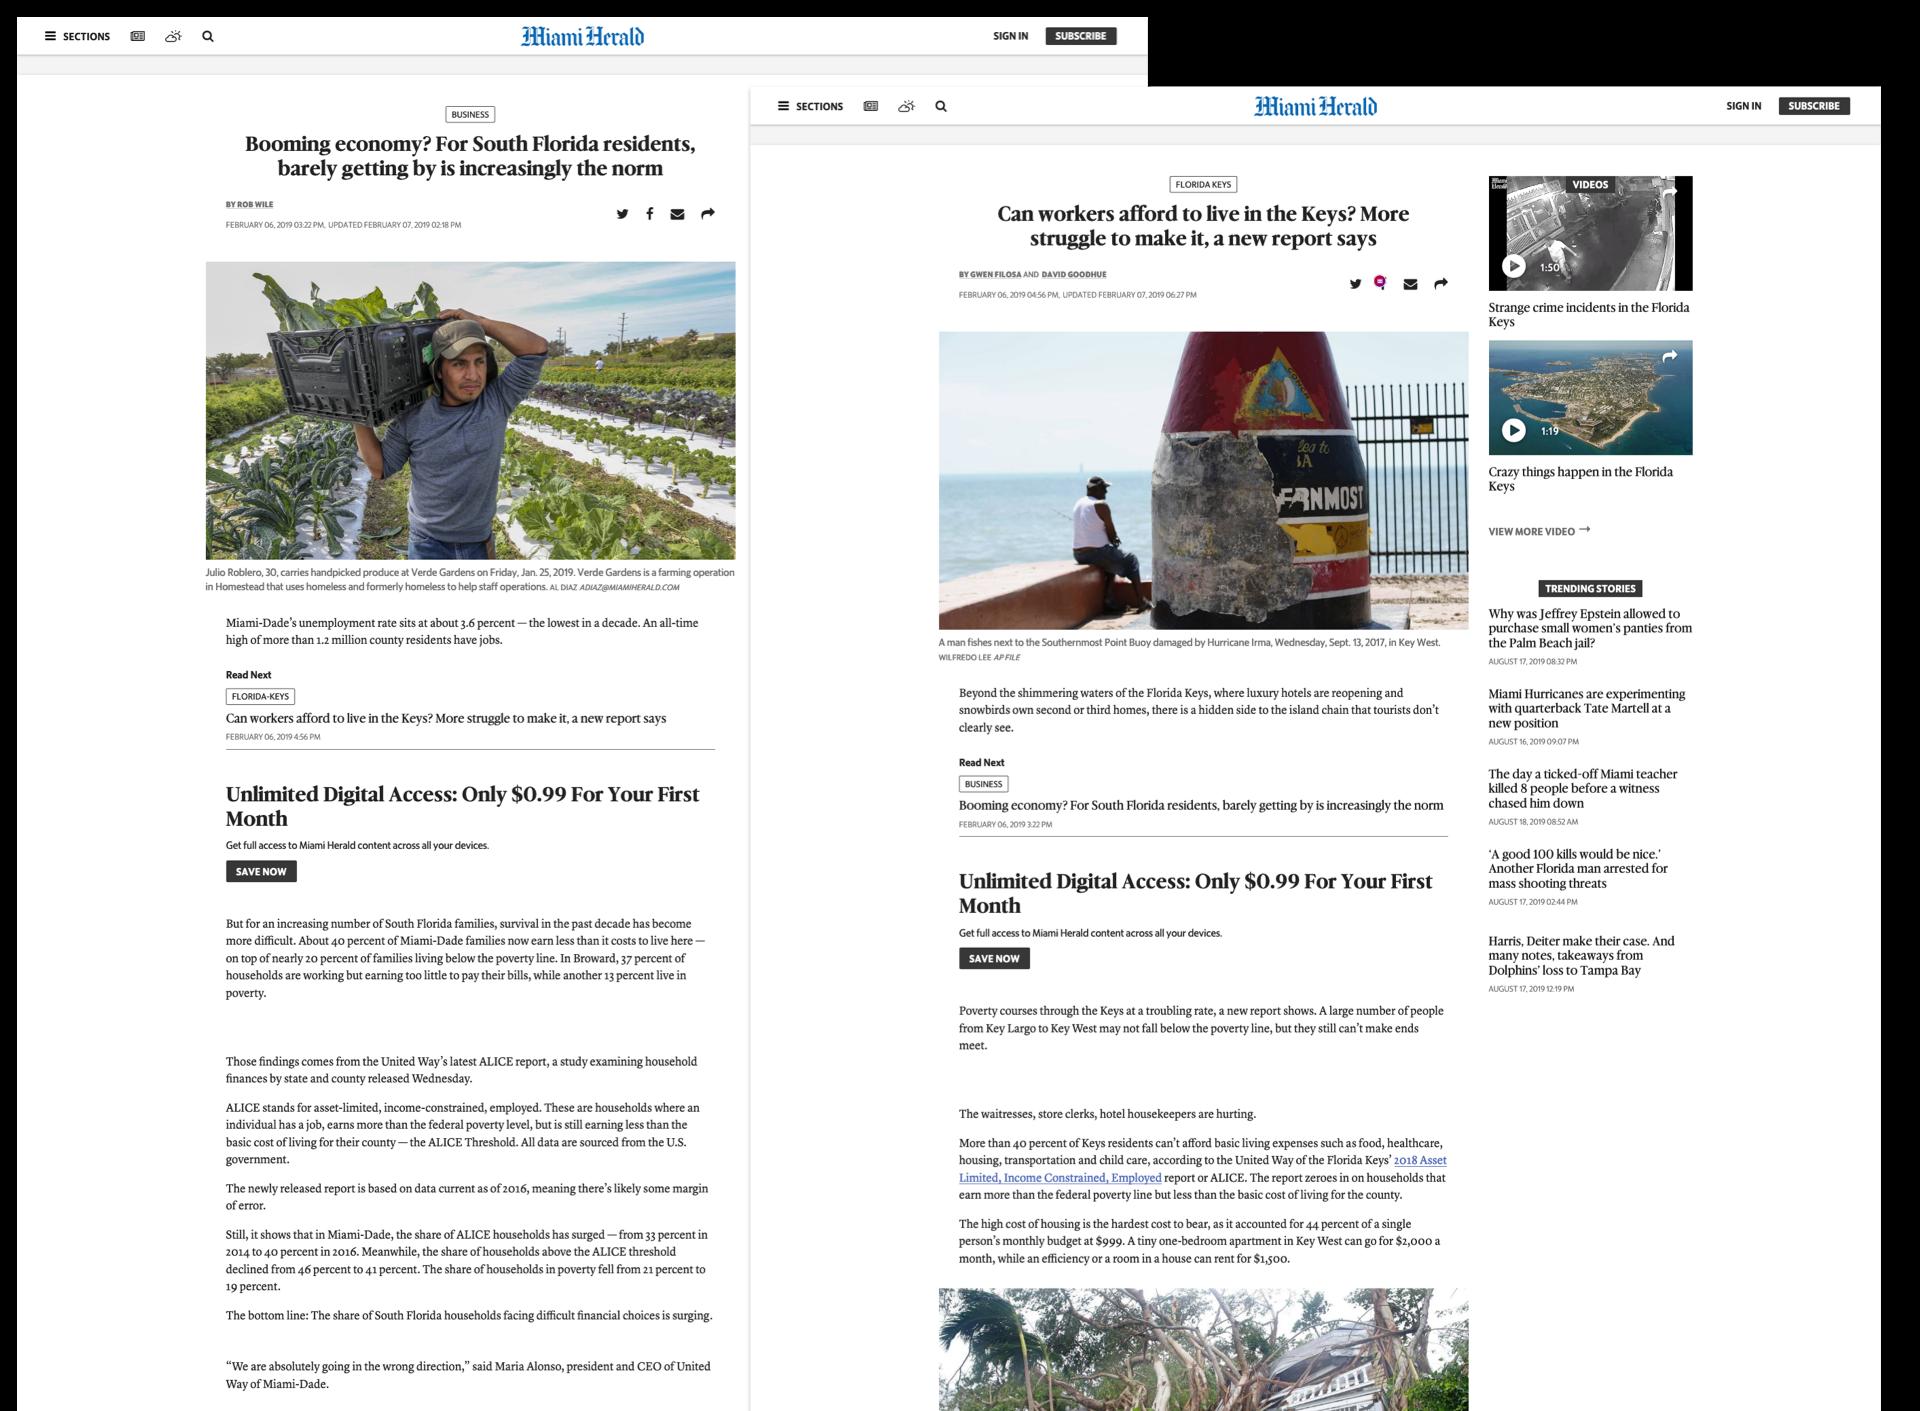 Florida-Seniors-Visualization-2018-Miami-Herald@1x